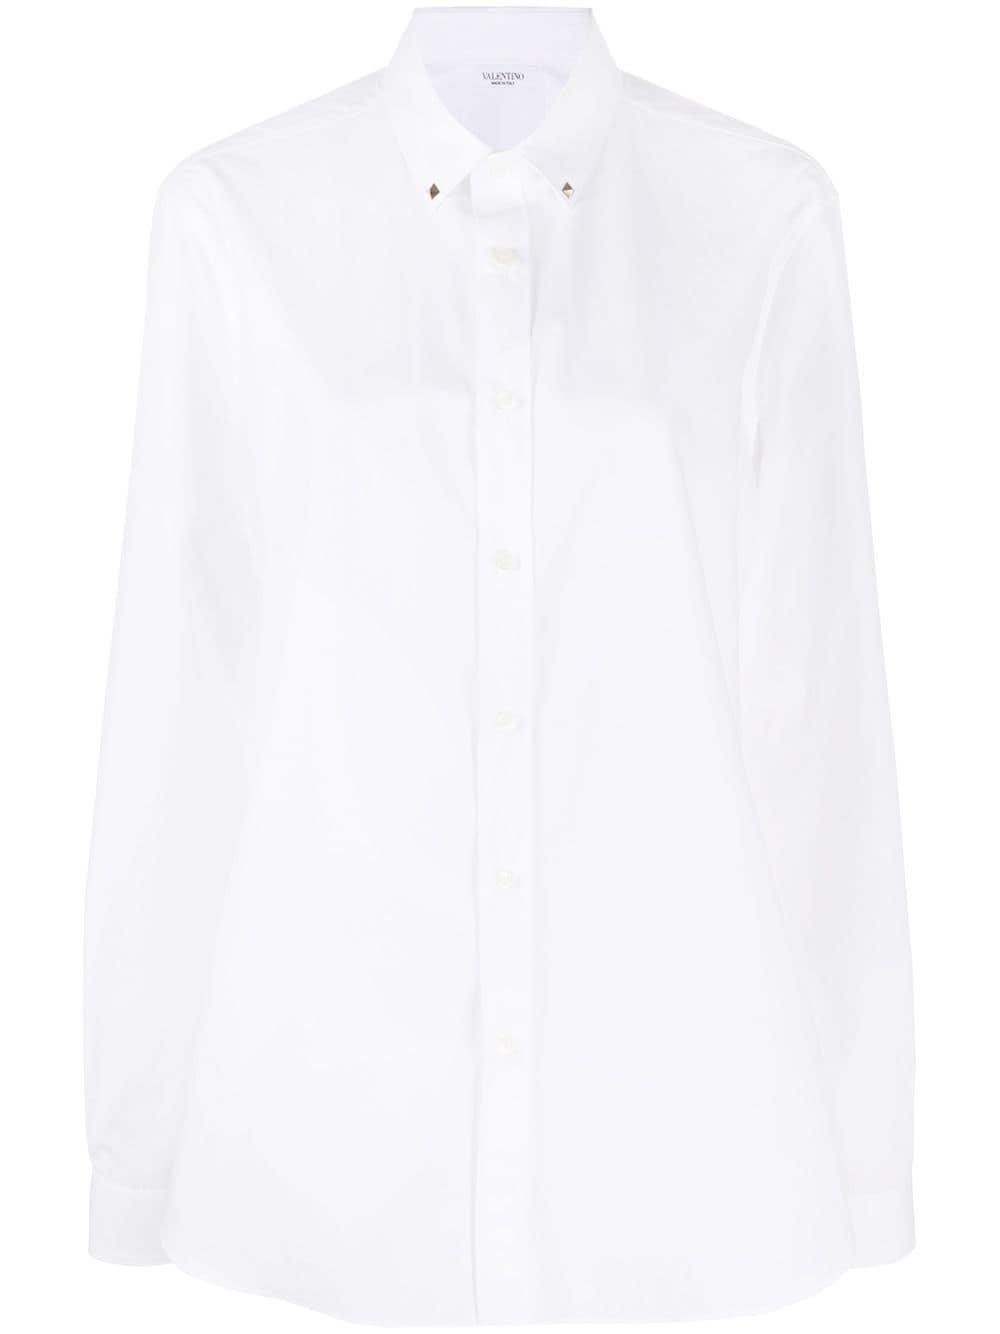 Untitled Cotton Shirt